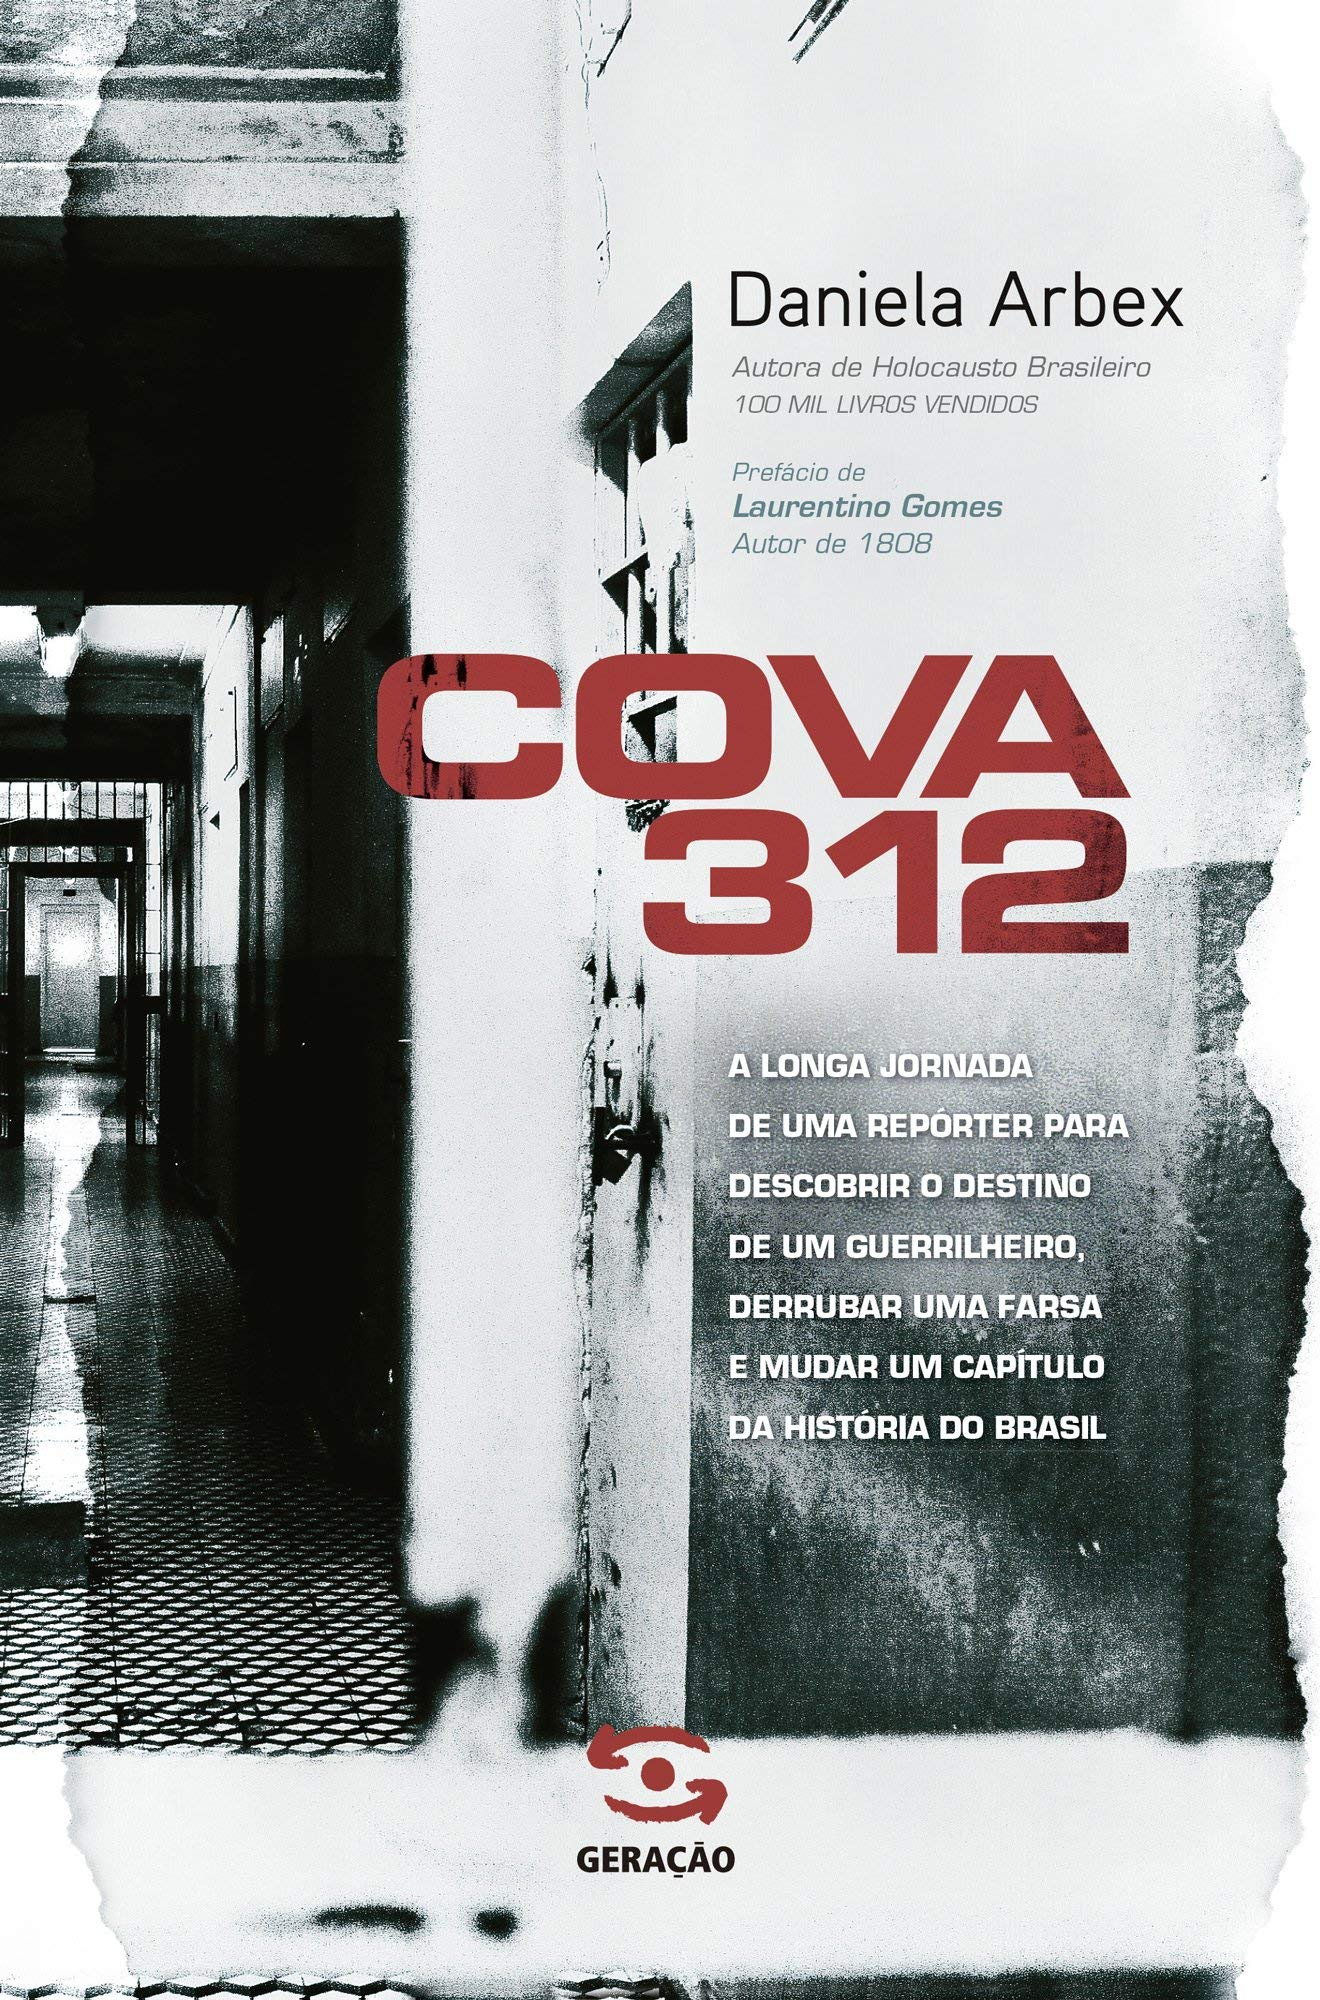 Cova 312 - 9788581302737 - Livros na Amazon Brasil